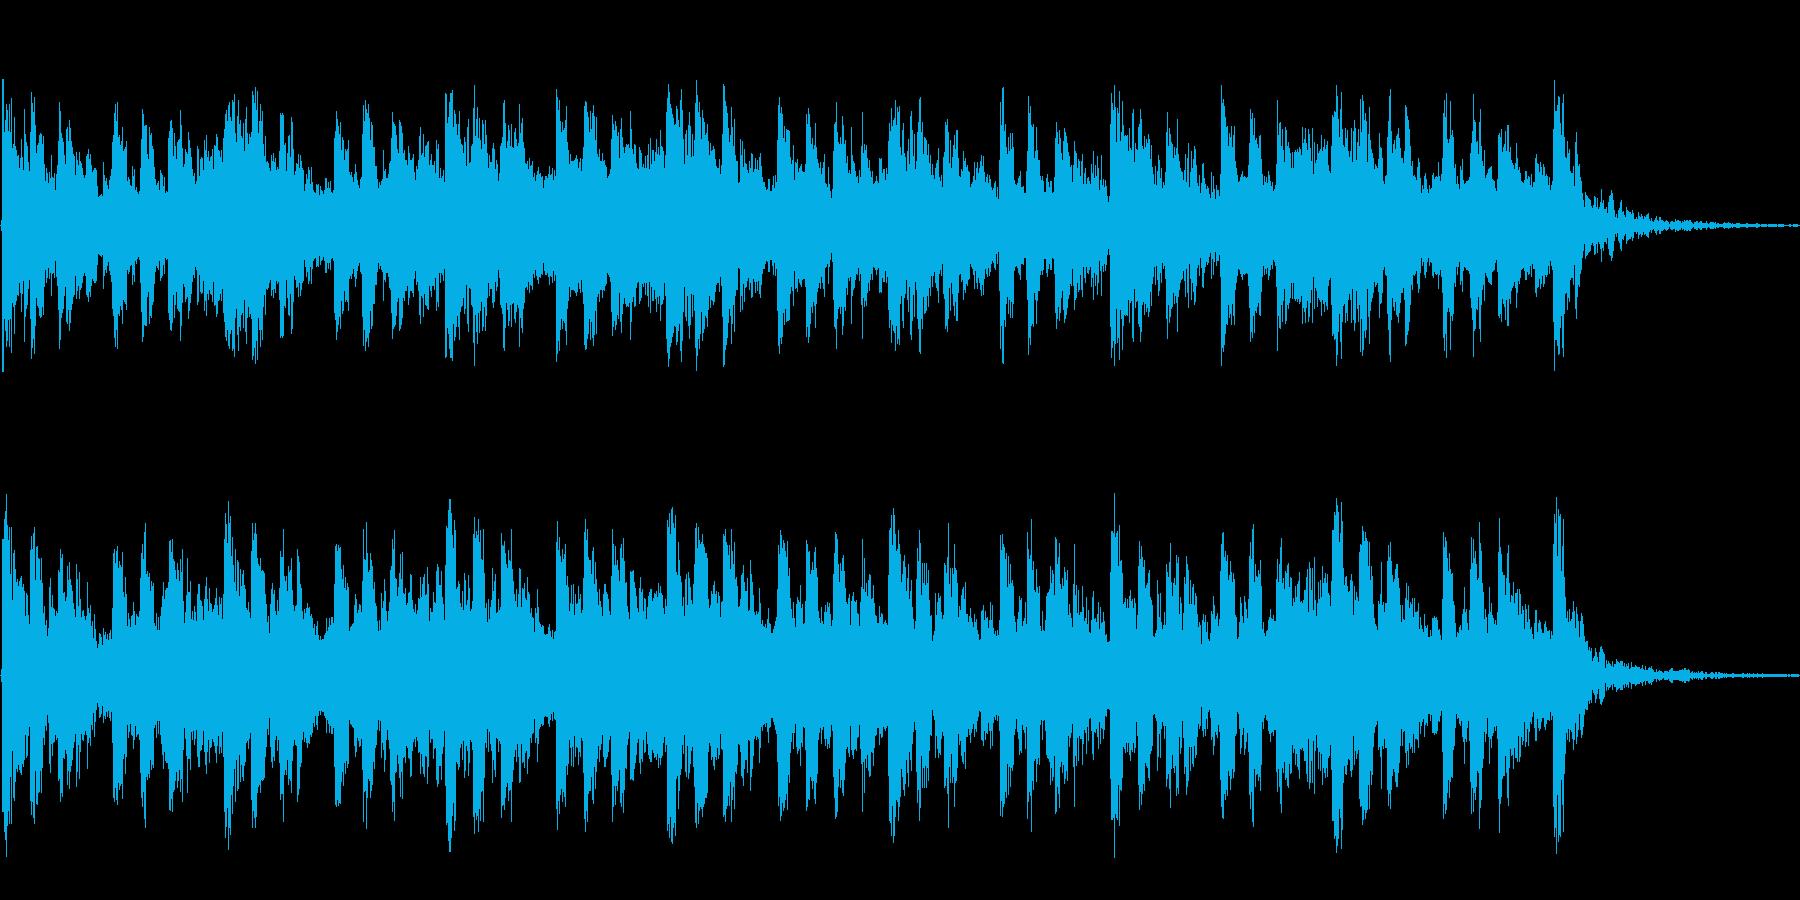 Soundtrack 3の再生済みの波形